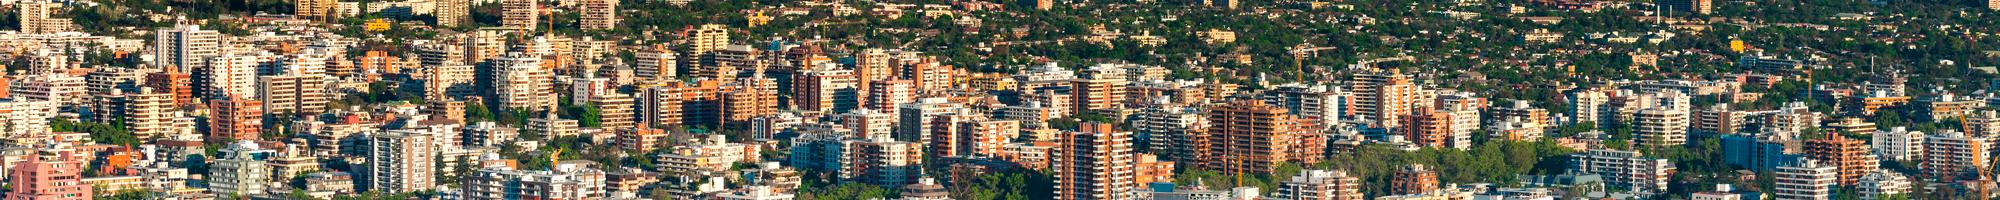 Hoteles en Talcahuano